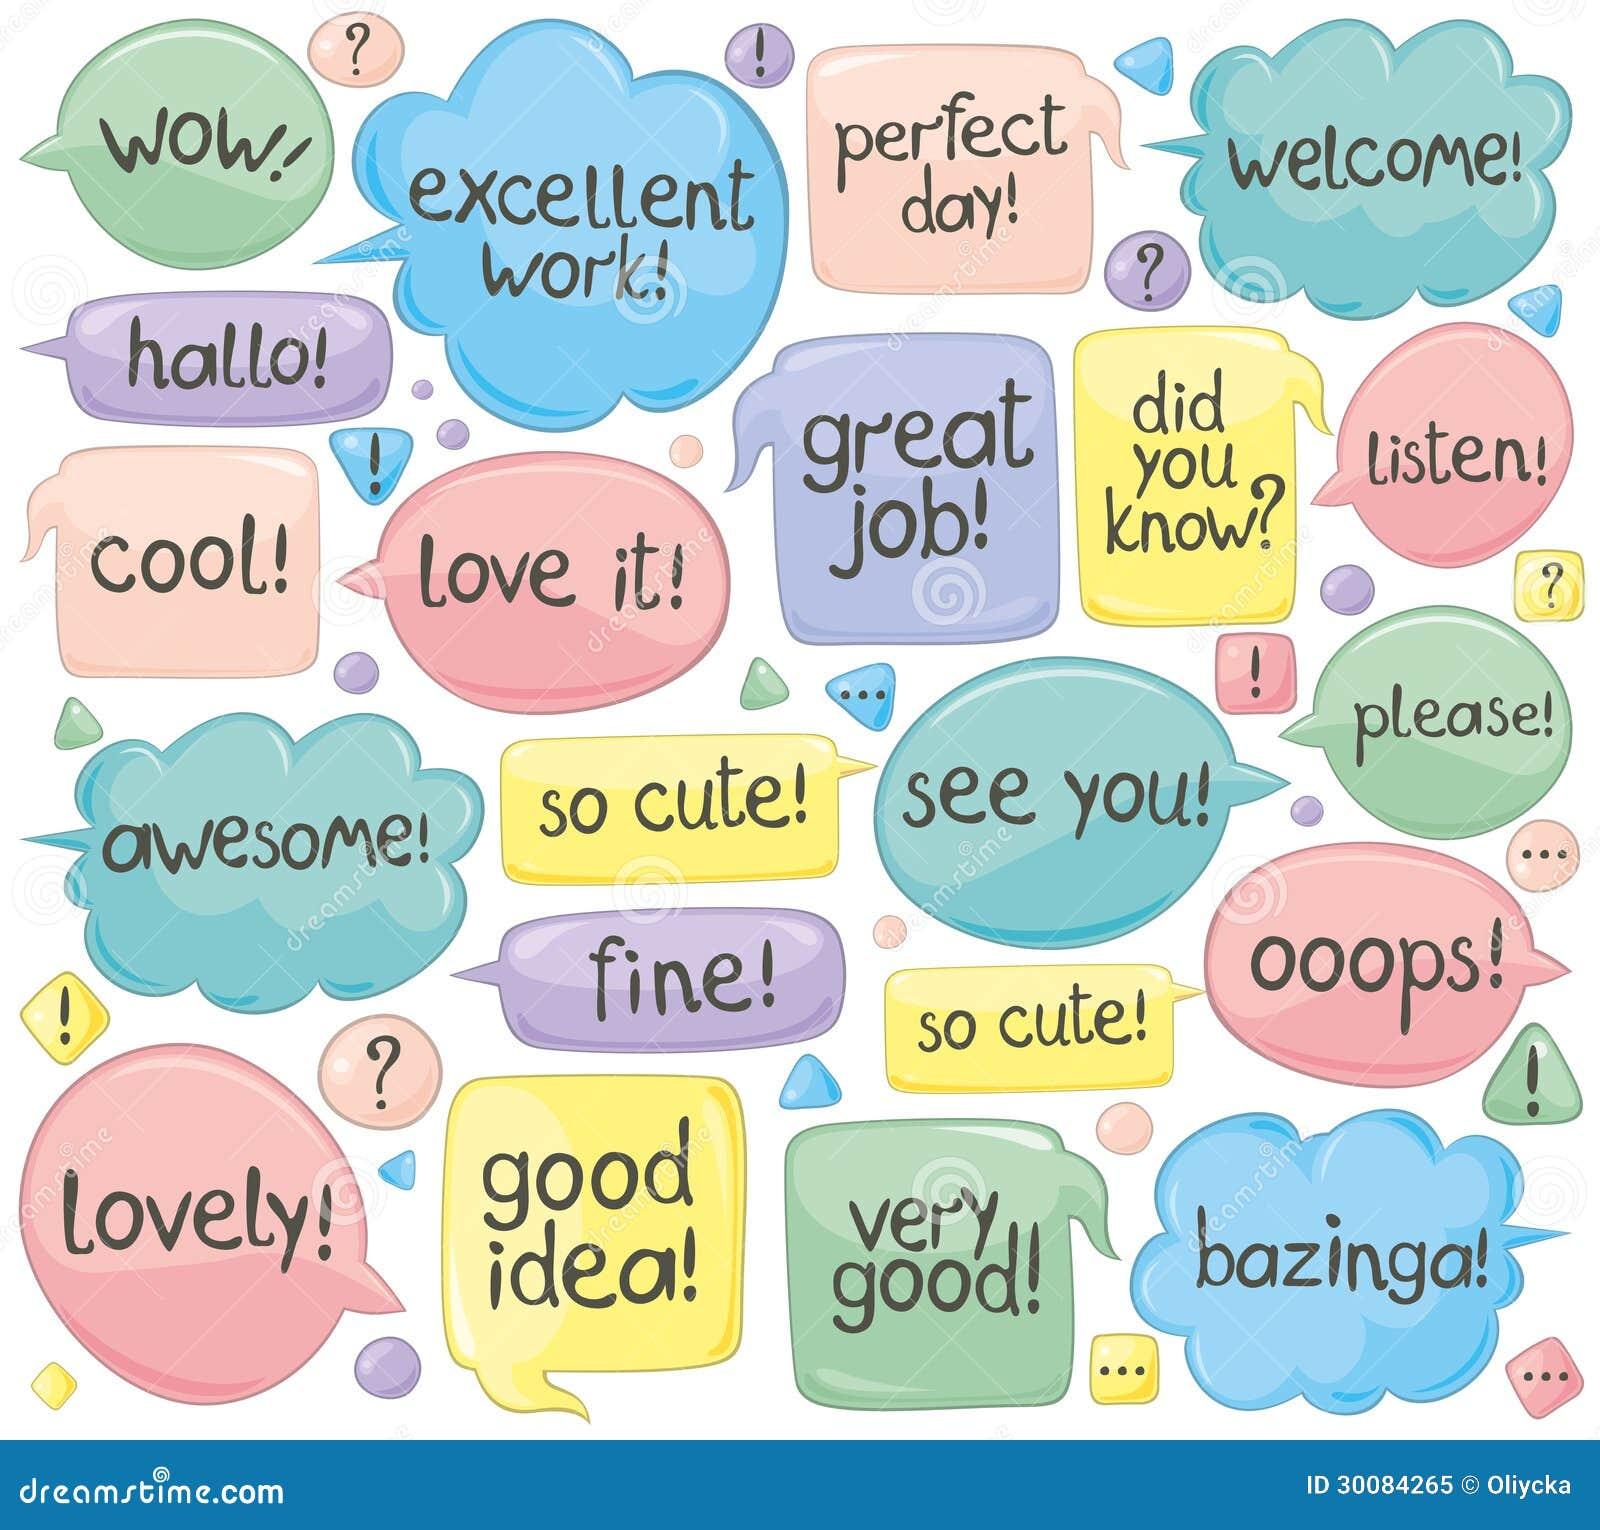 Handgeschriebene Phrasen in den Sprache-Ballonen